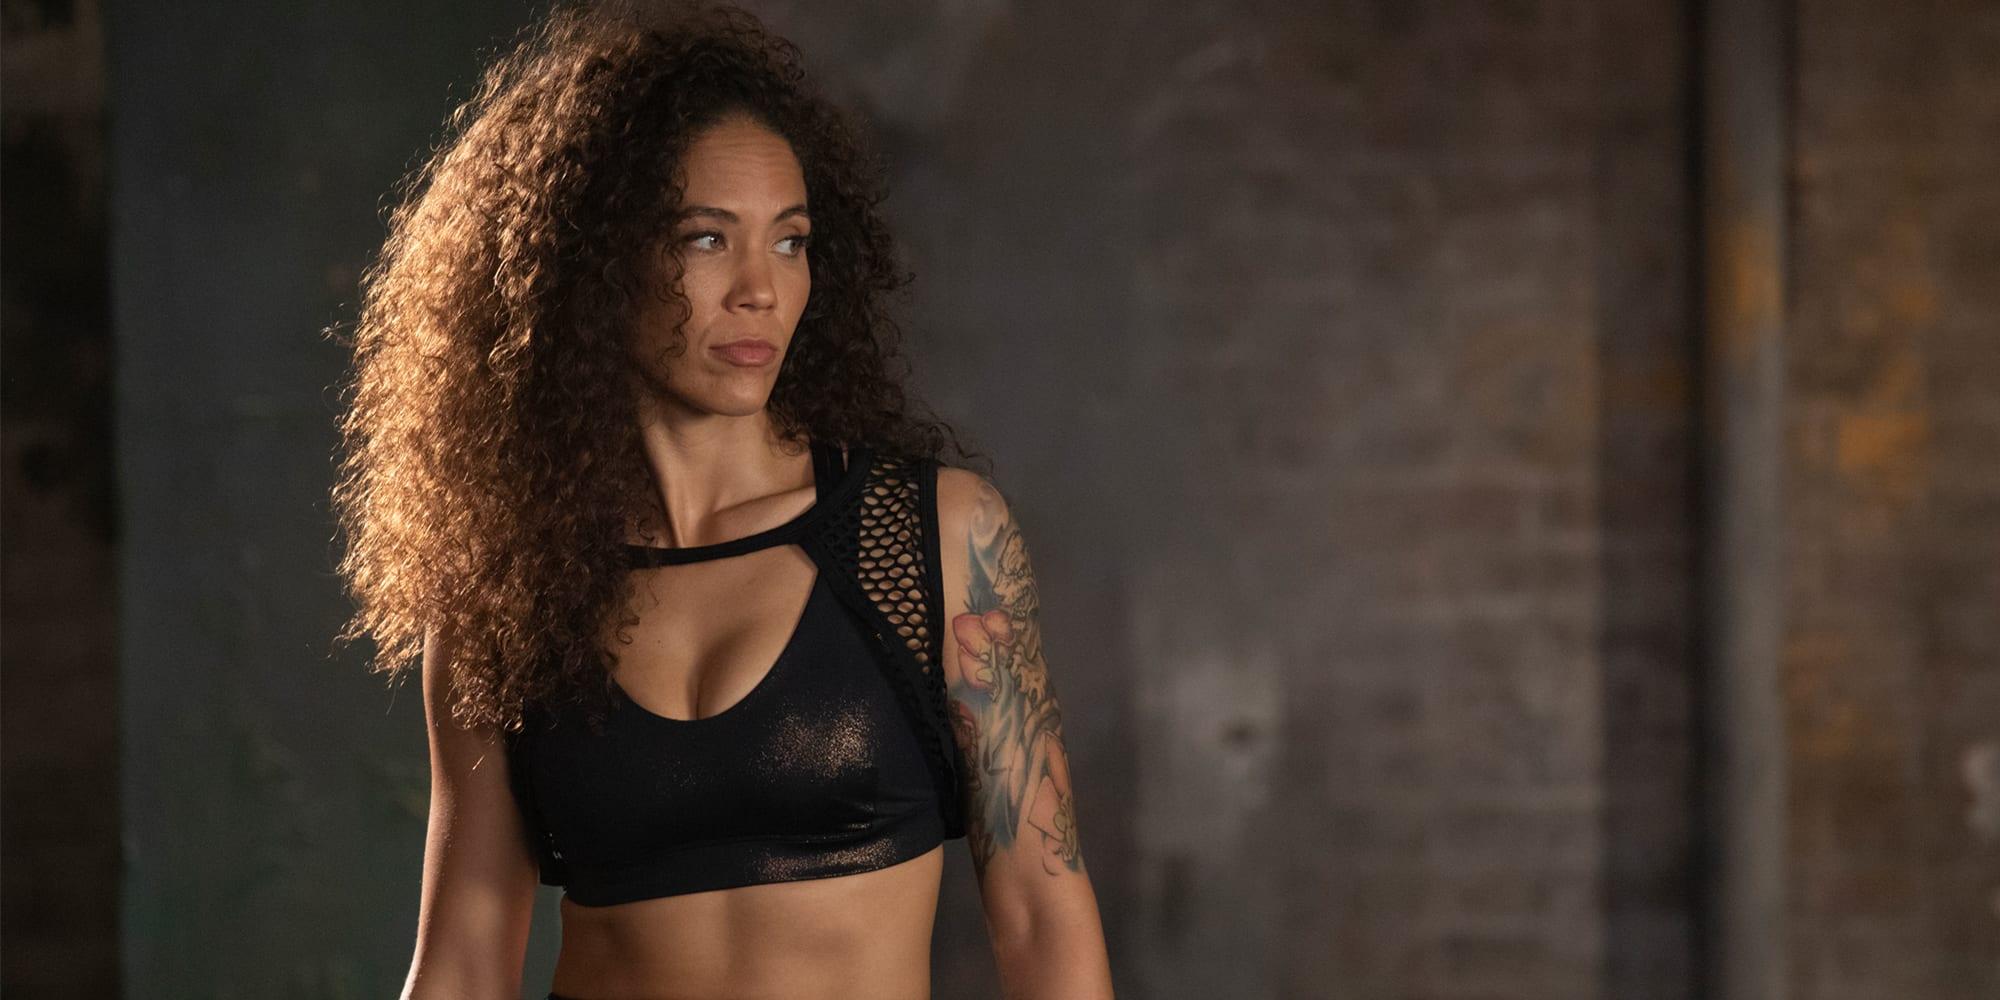 Meet Anisha Gibbs: Dancer, Stuntwoman, and Positivity Powerhouse